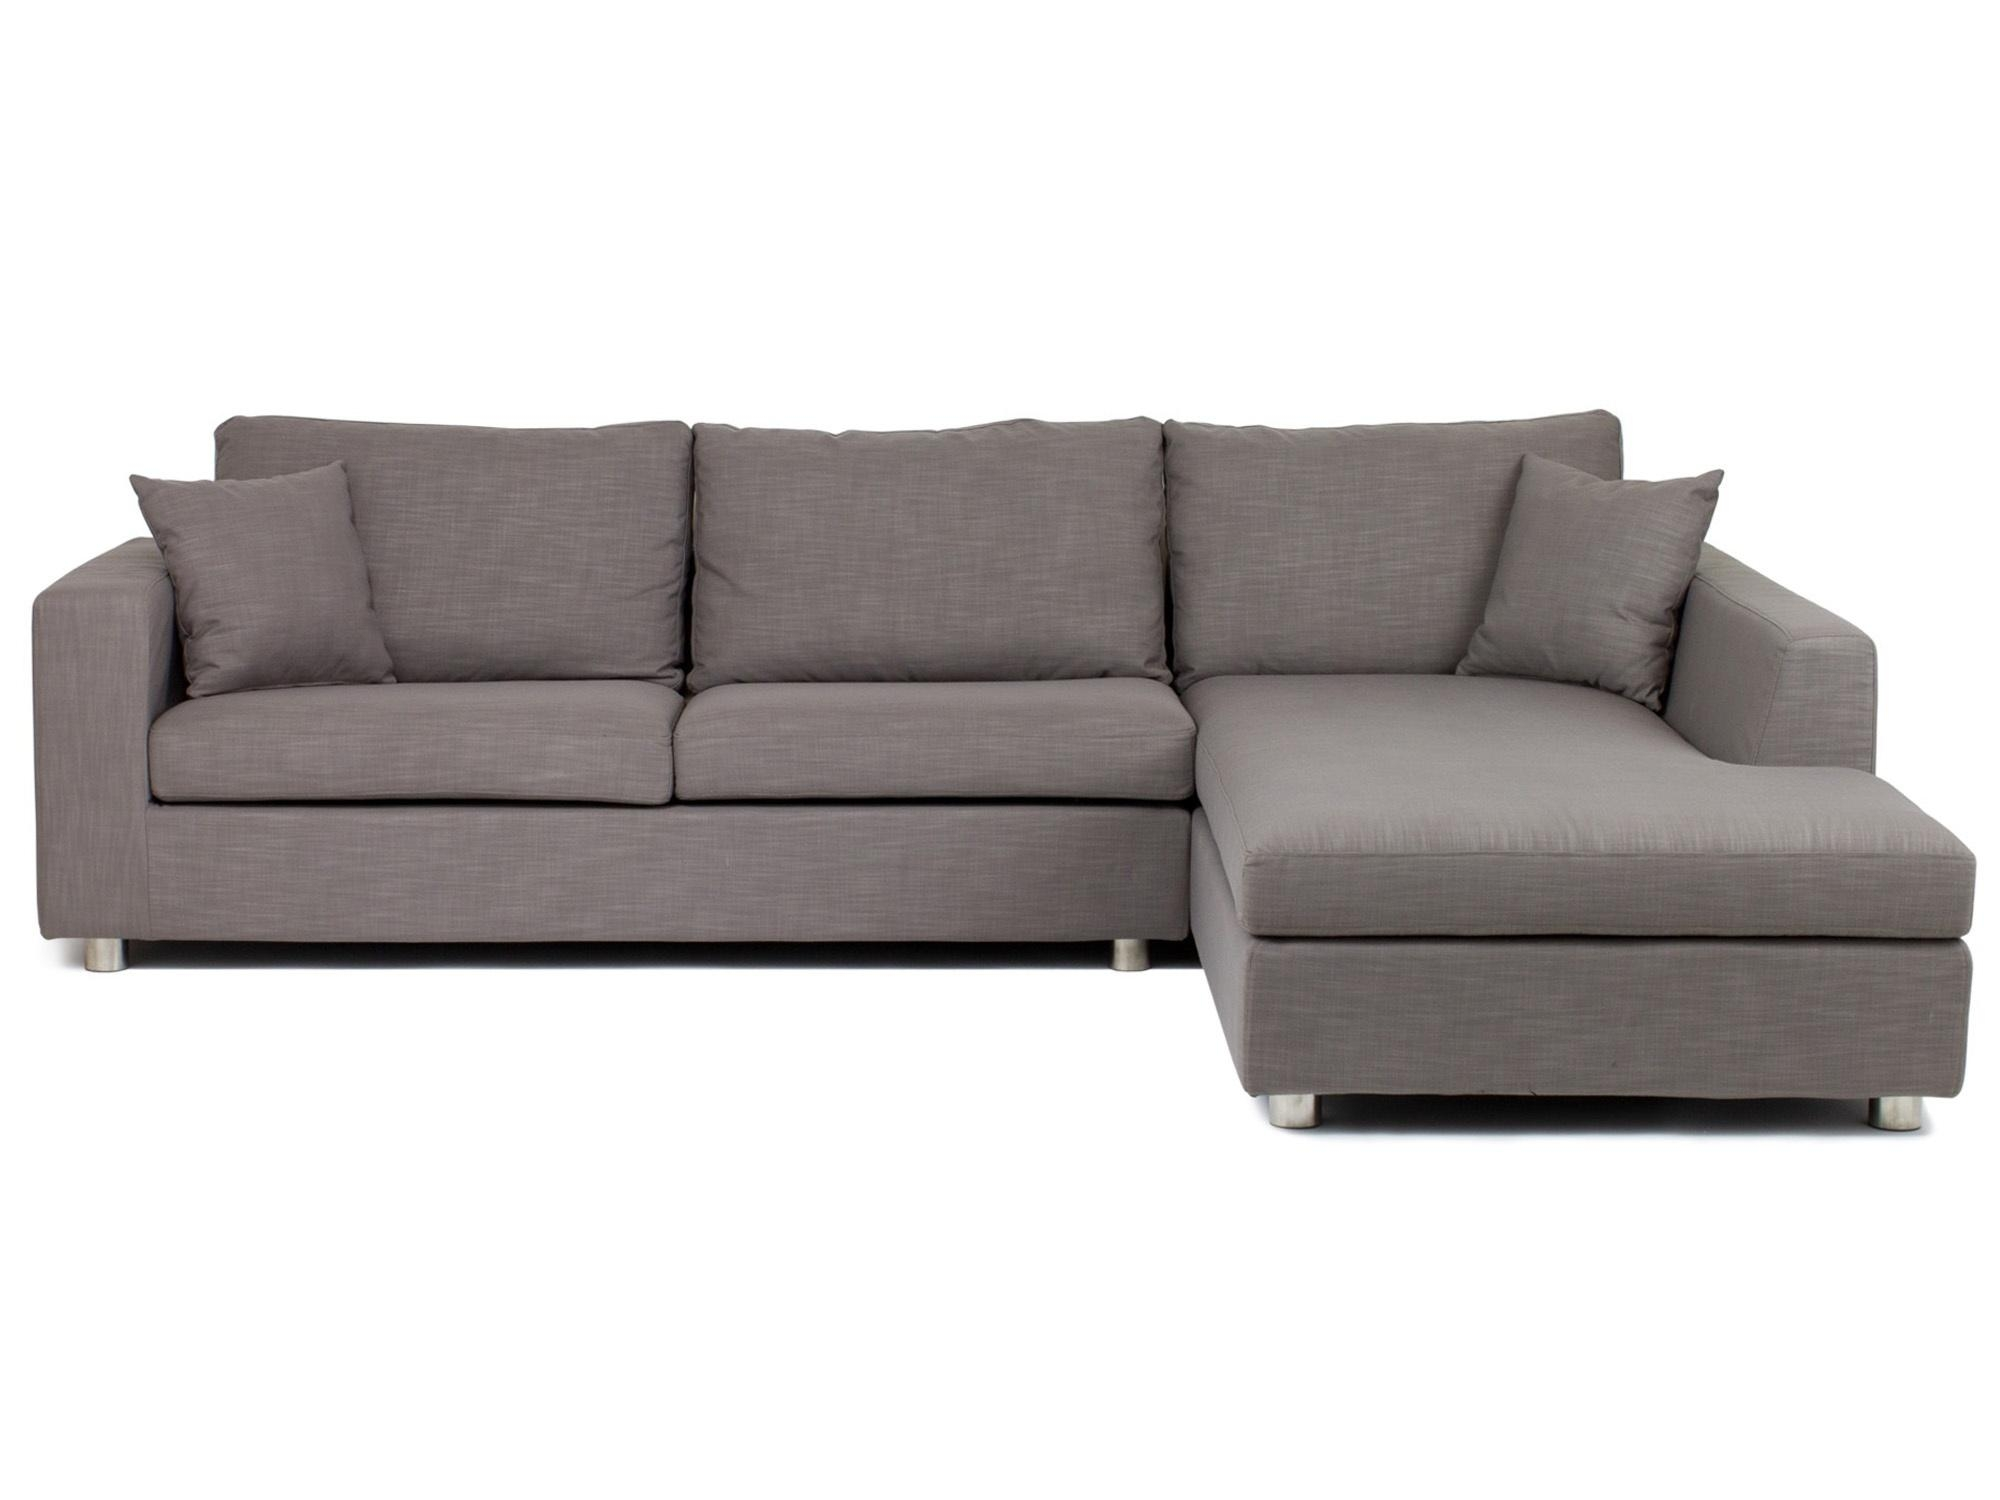 Sofas Center : Ikea Corner Sofa With Storage L Shape Storagedfs For Corner Sofa Bed With Storage Ikea (View 12 of 20)